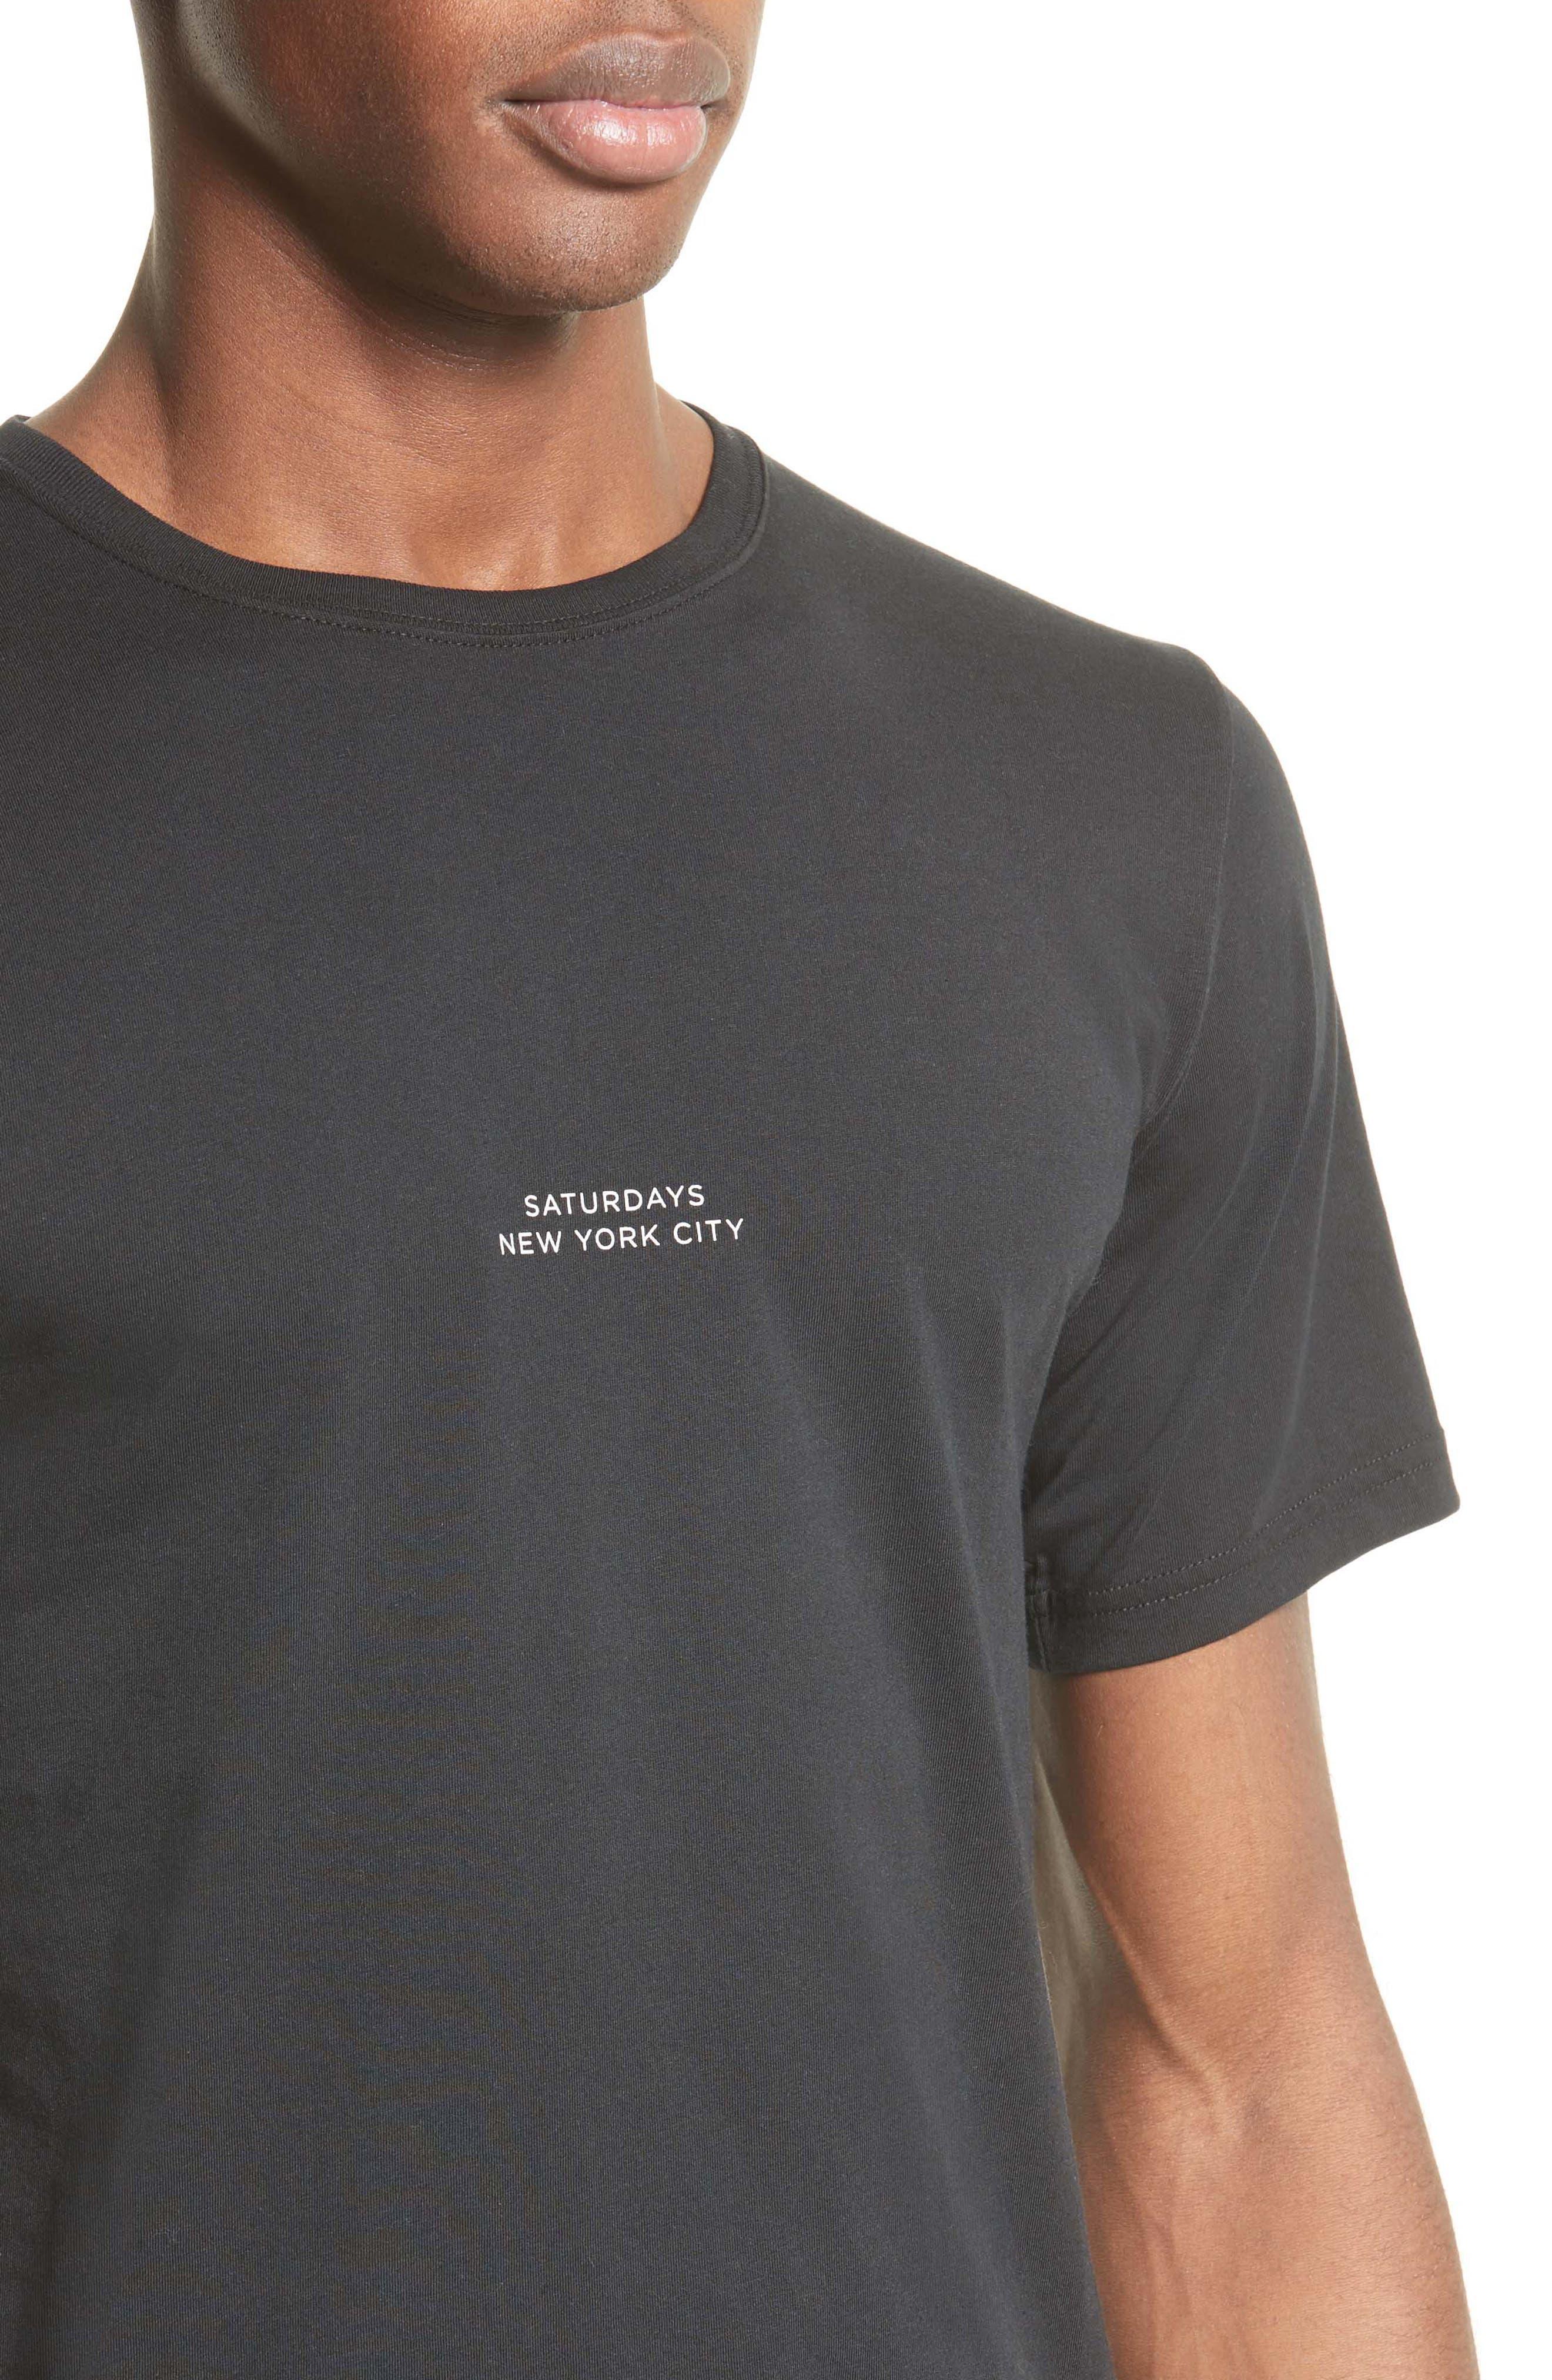 Gotham T-Shirt,                             Alternate thumbnail 4, color,                             001